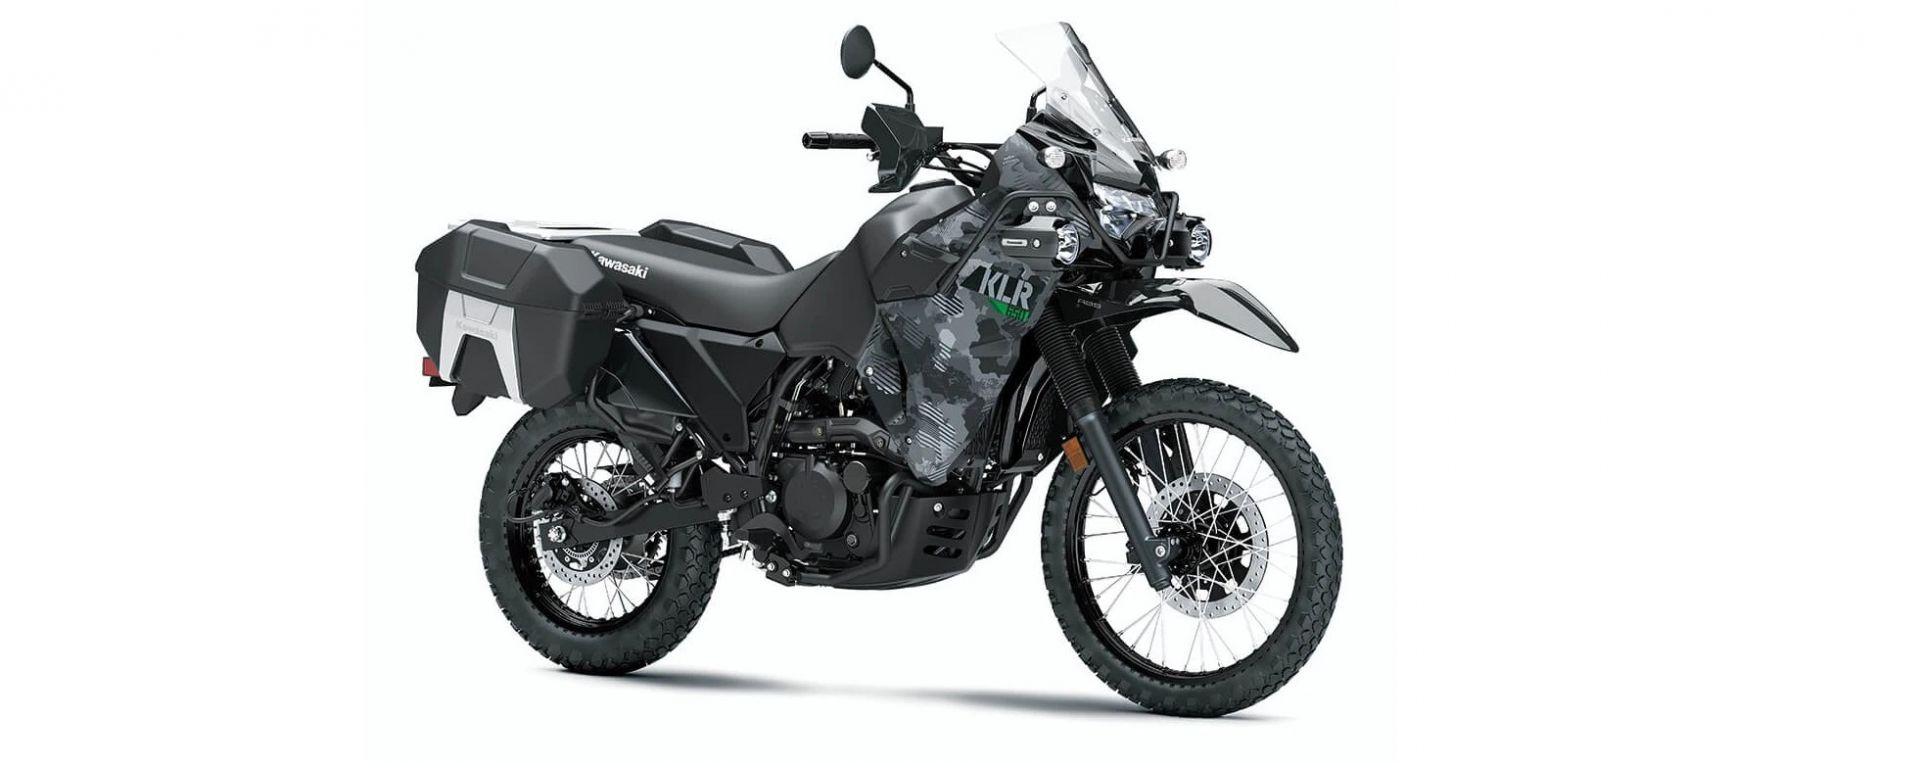 Kawasaki KLR 650 torna sul mercato